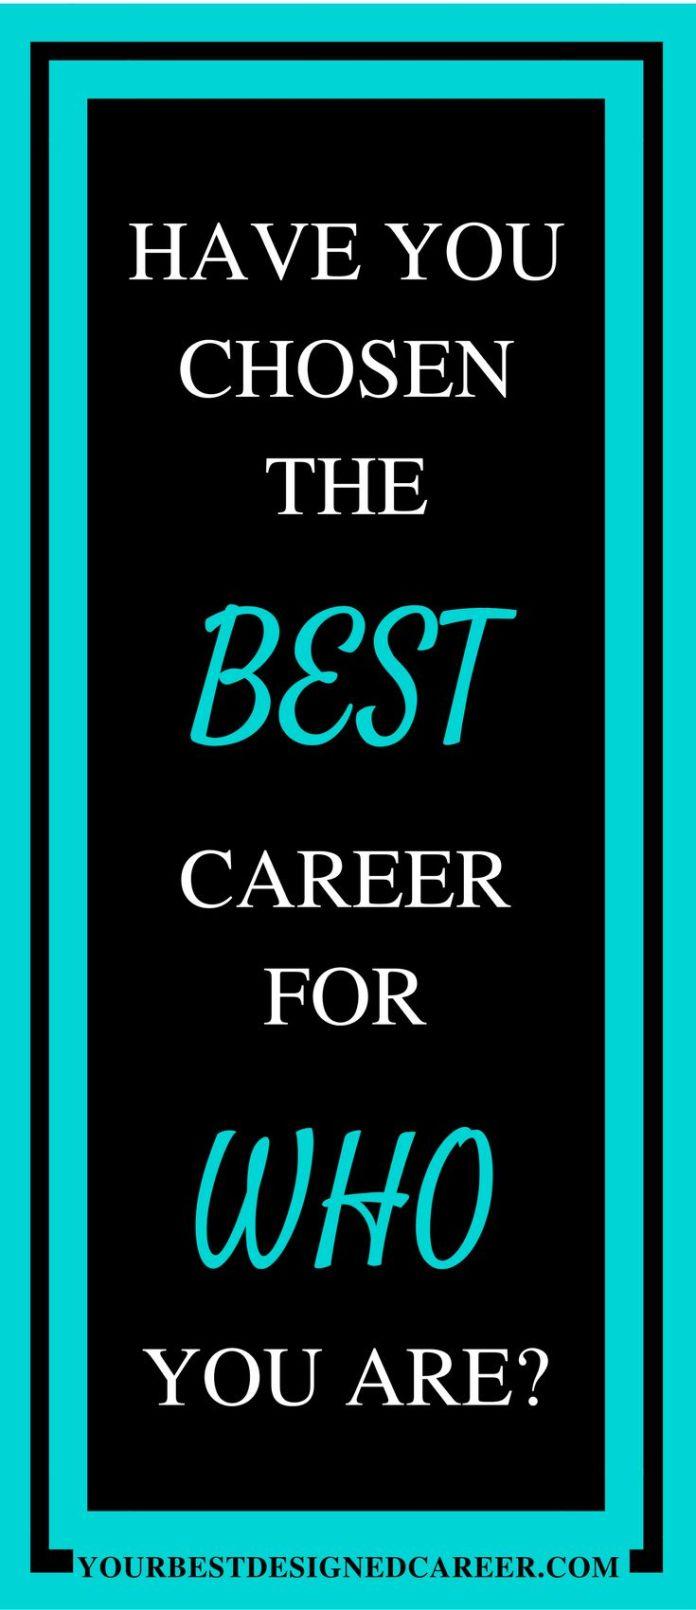 Career Infographic Career Career Change Dream Job Job Change